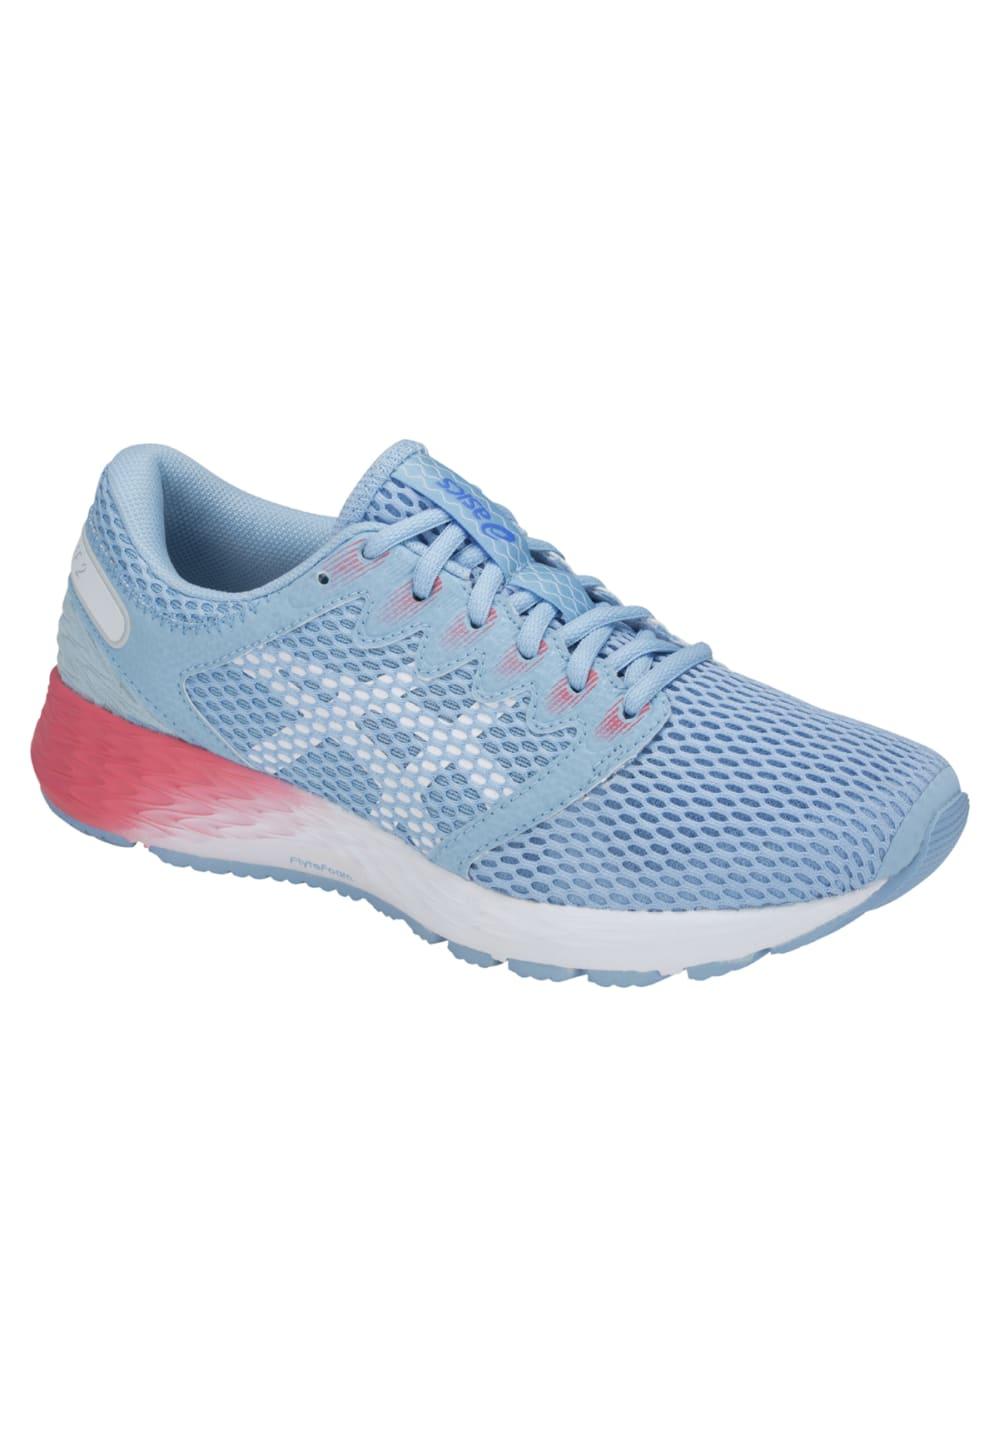 ASICS RoadHawk FF 2 Chaussures running pour Femme Blanc